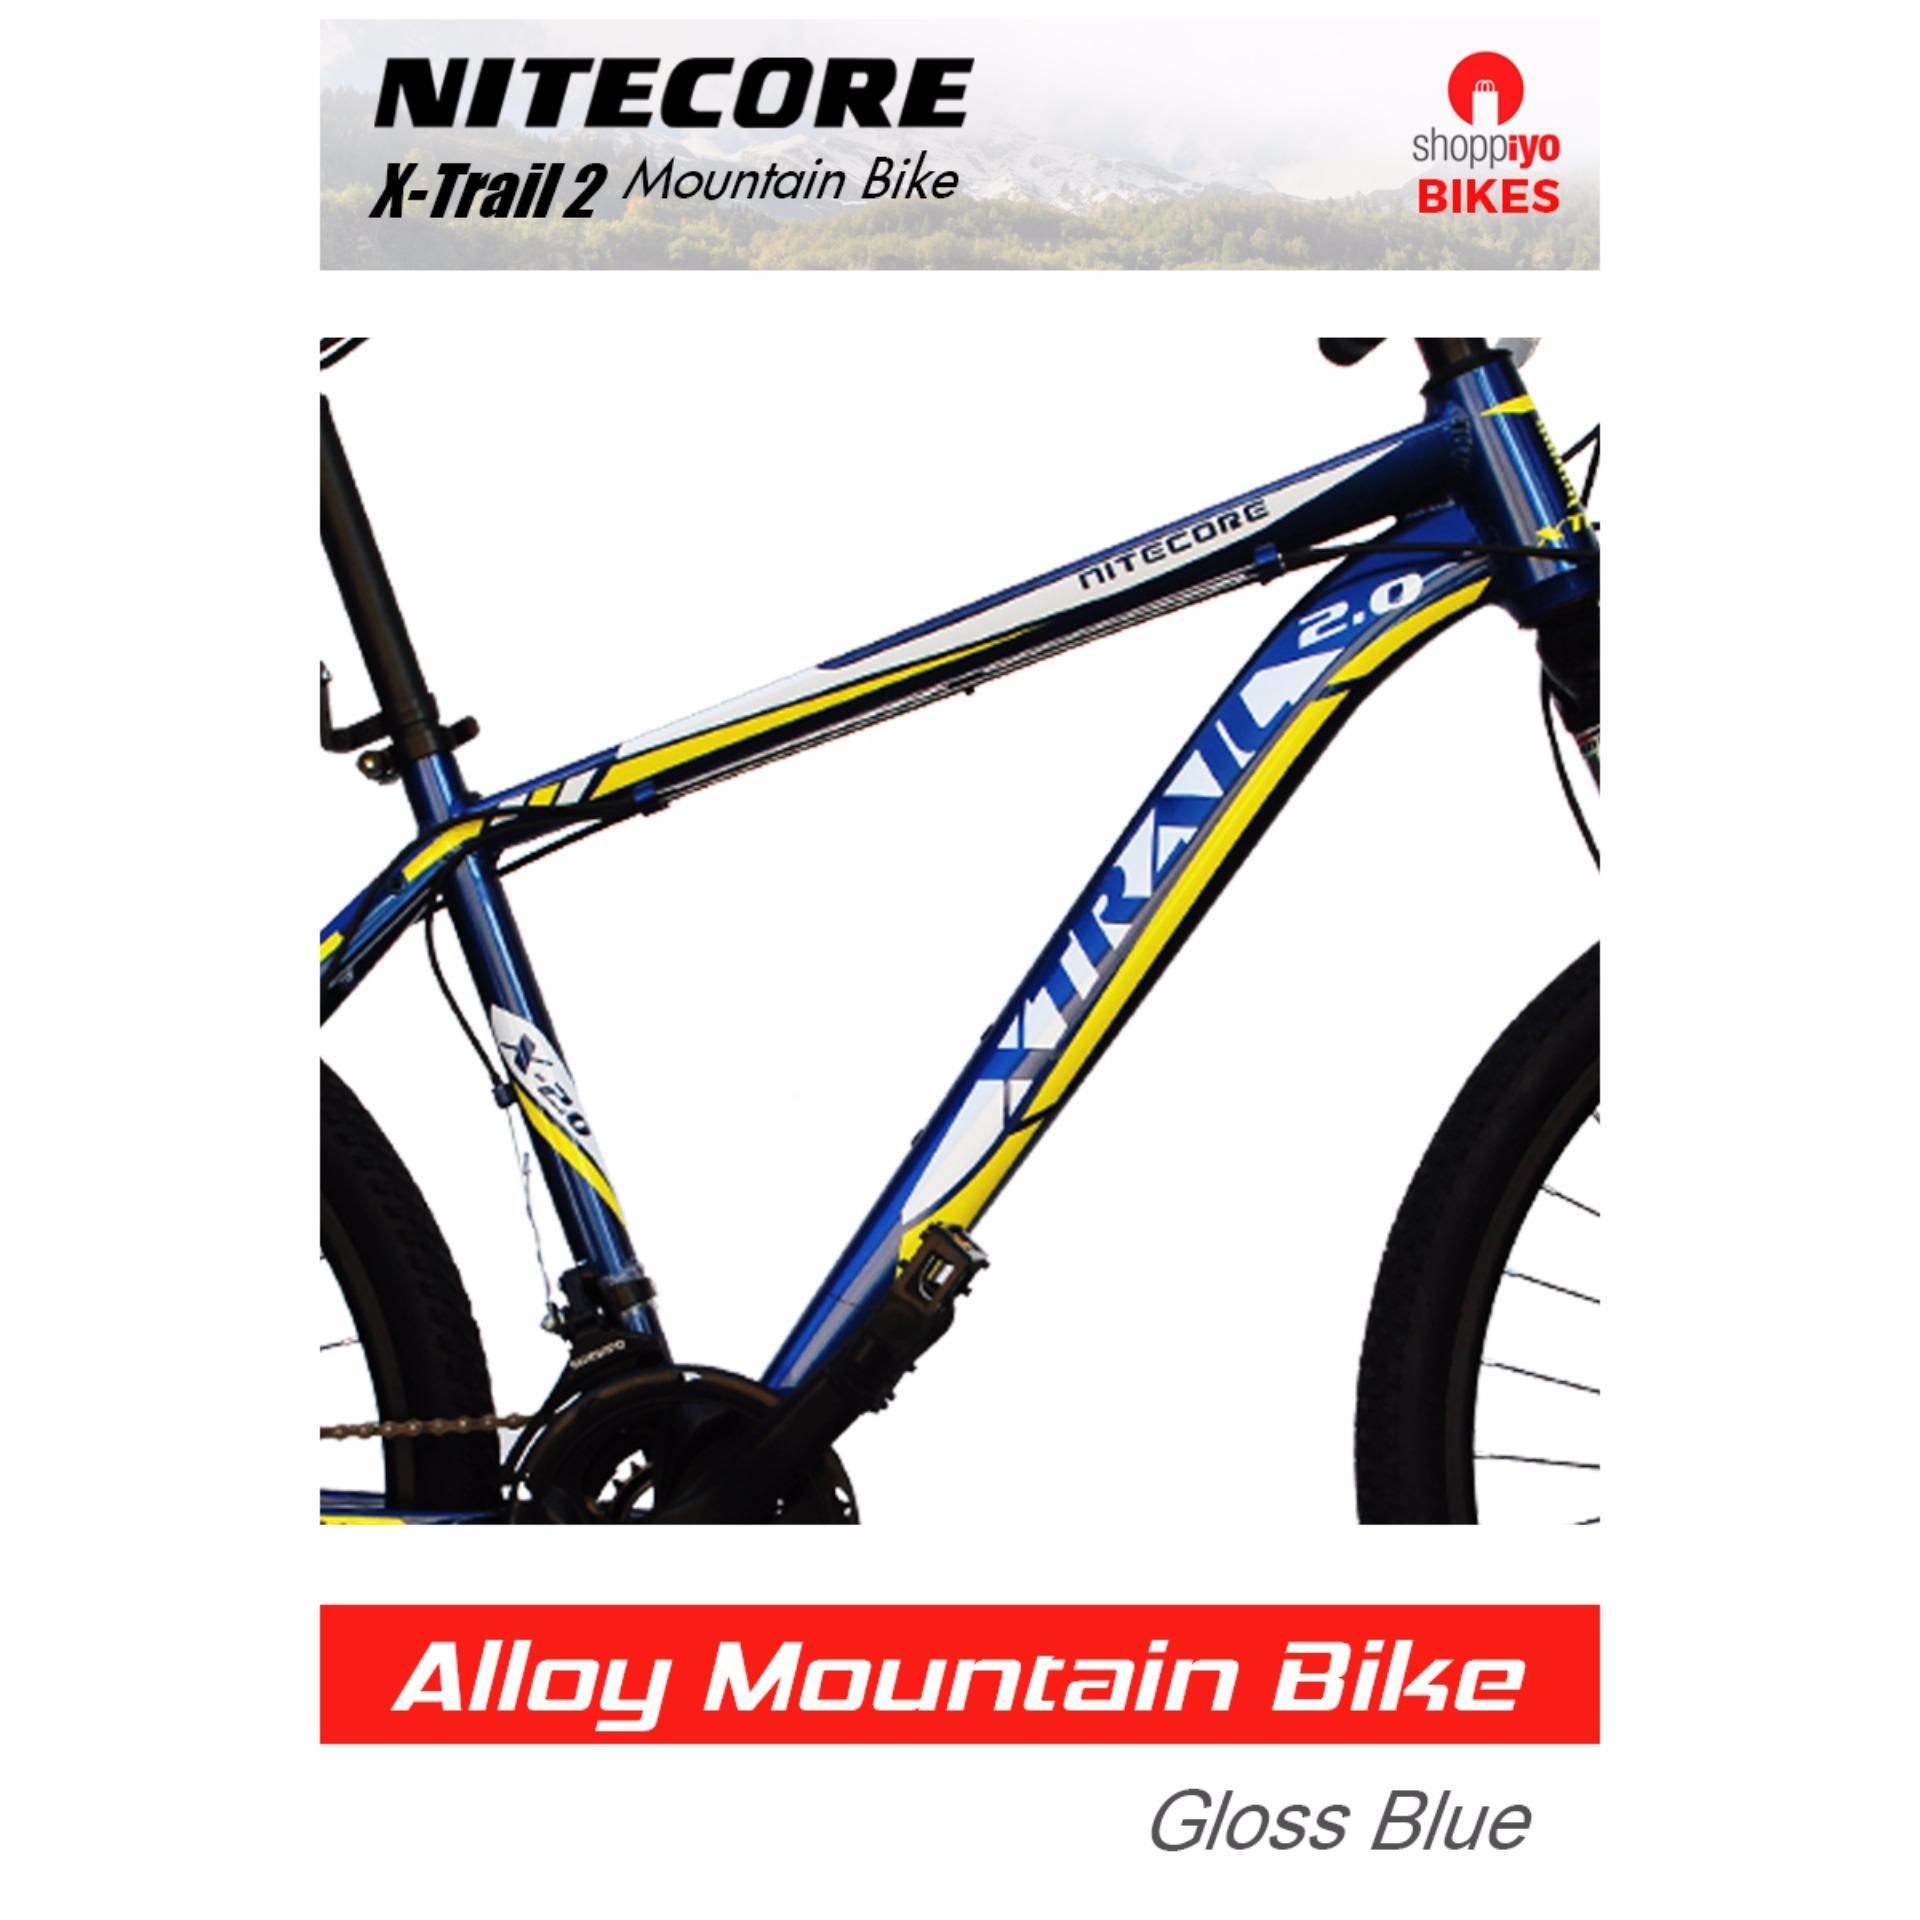 Cycling Bicycle Aluminium Alloy MTB Mountain Bike Handlebar Stem 31.8mm - intl .